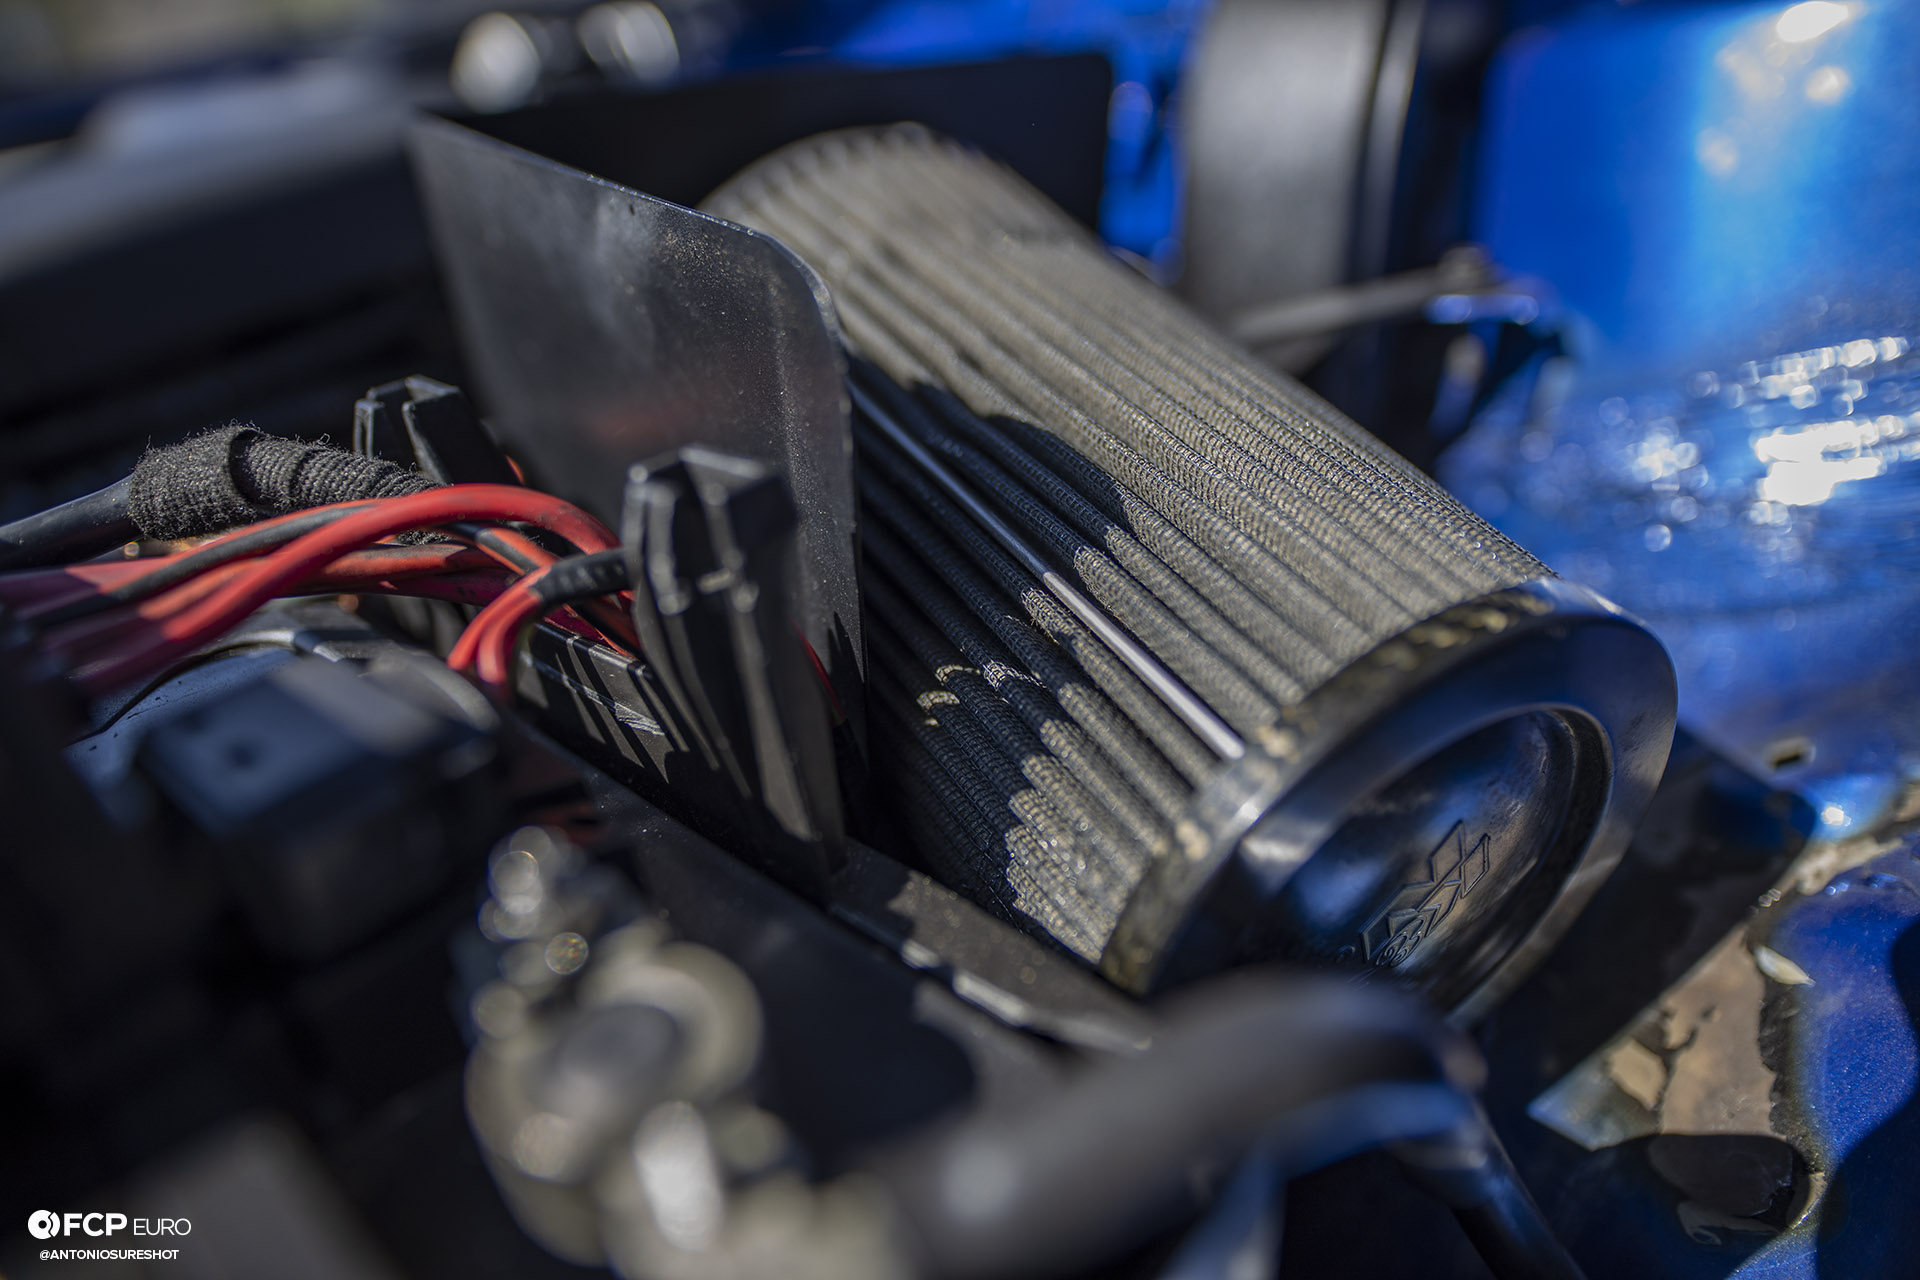 MK4 Volkswagen Golf R32 Deep Blue Pearl Air Ride Engine Bay